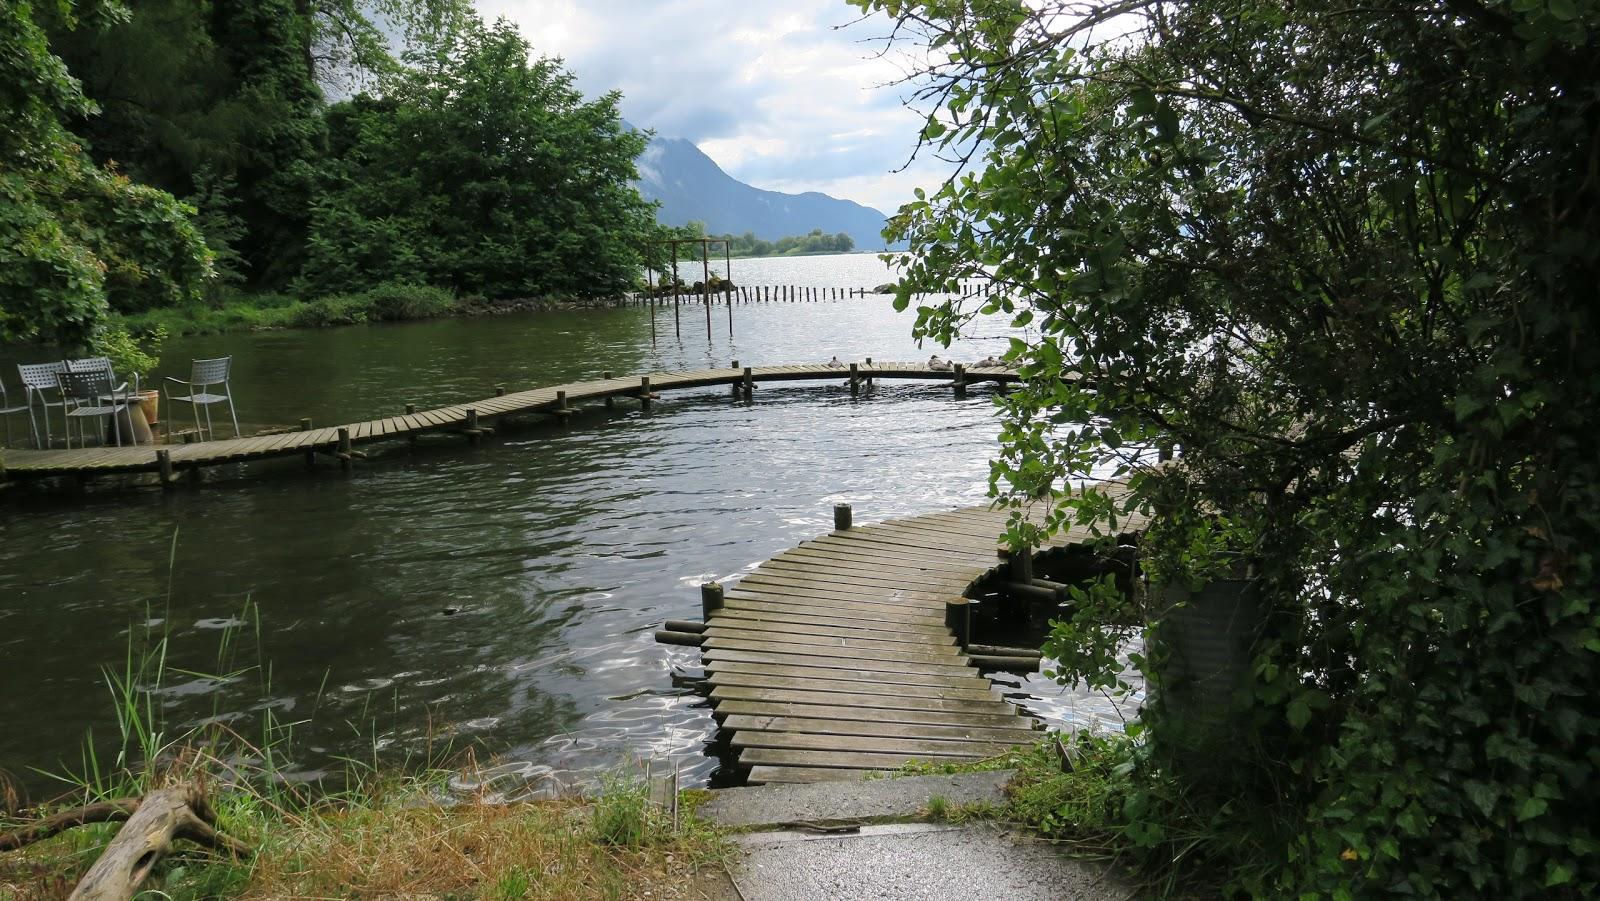 Jardin Mineral Zen Photo visit jardin instinctif on your trip to aigle or switzerland